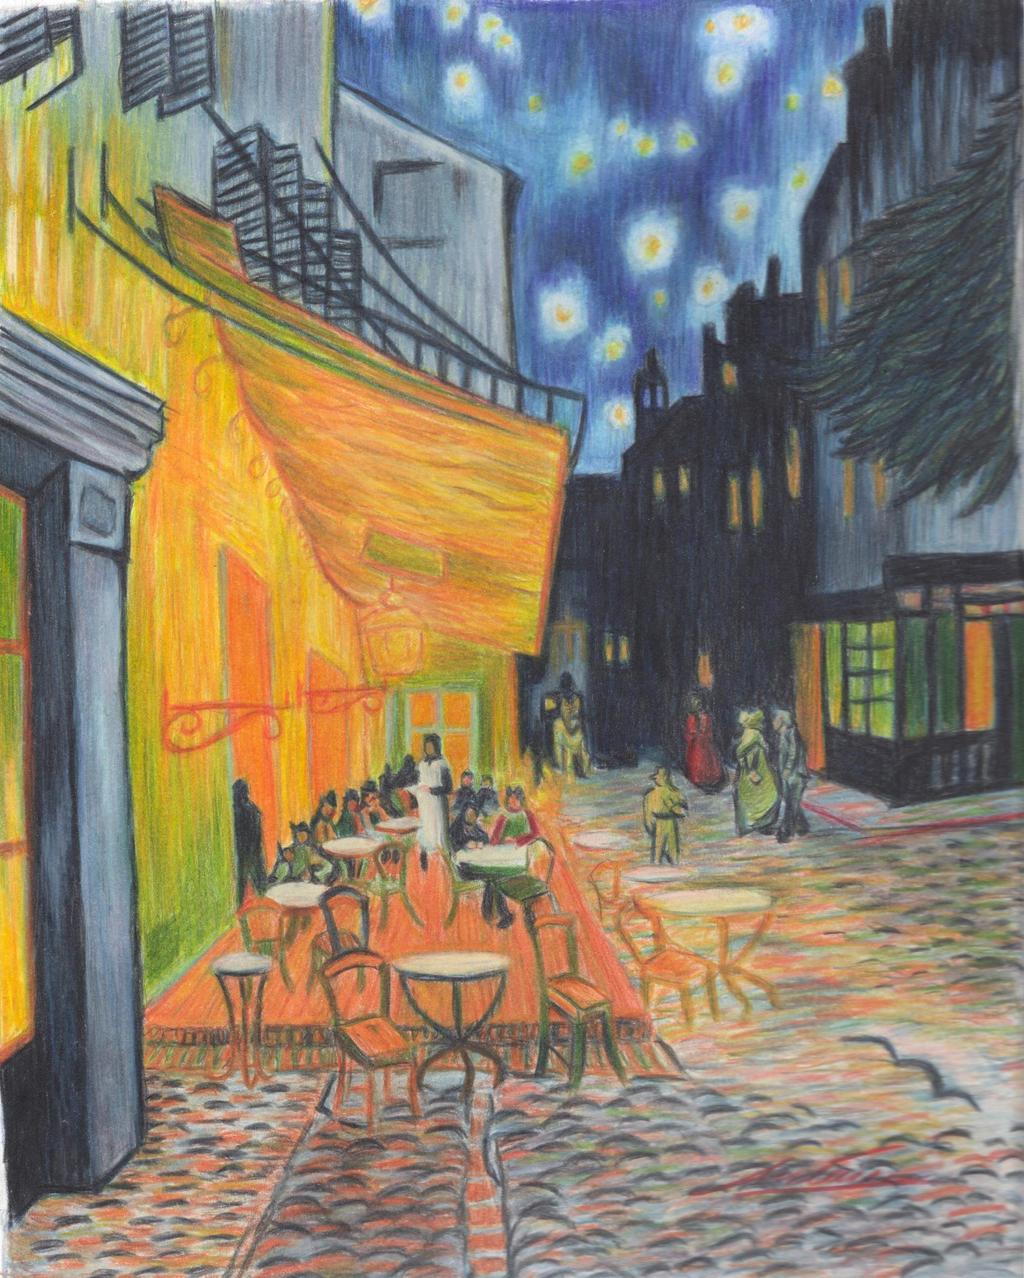 Van Gogh Cafe Terrace at Night Wallpaper Van Gogh 39 s Cafe Terrace at